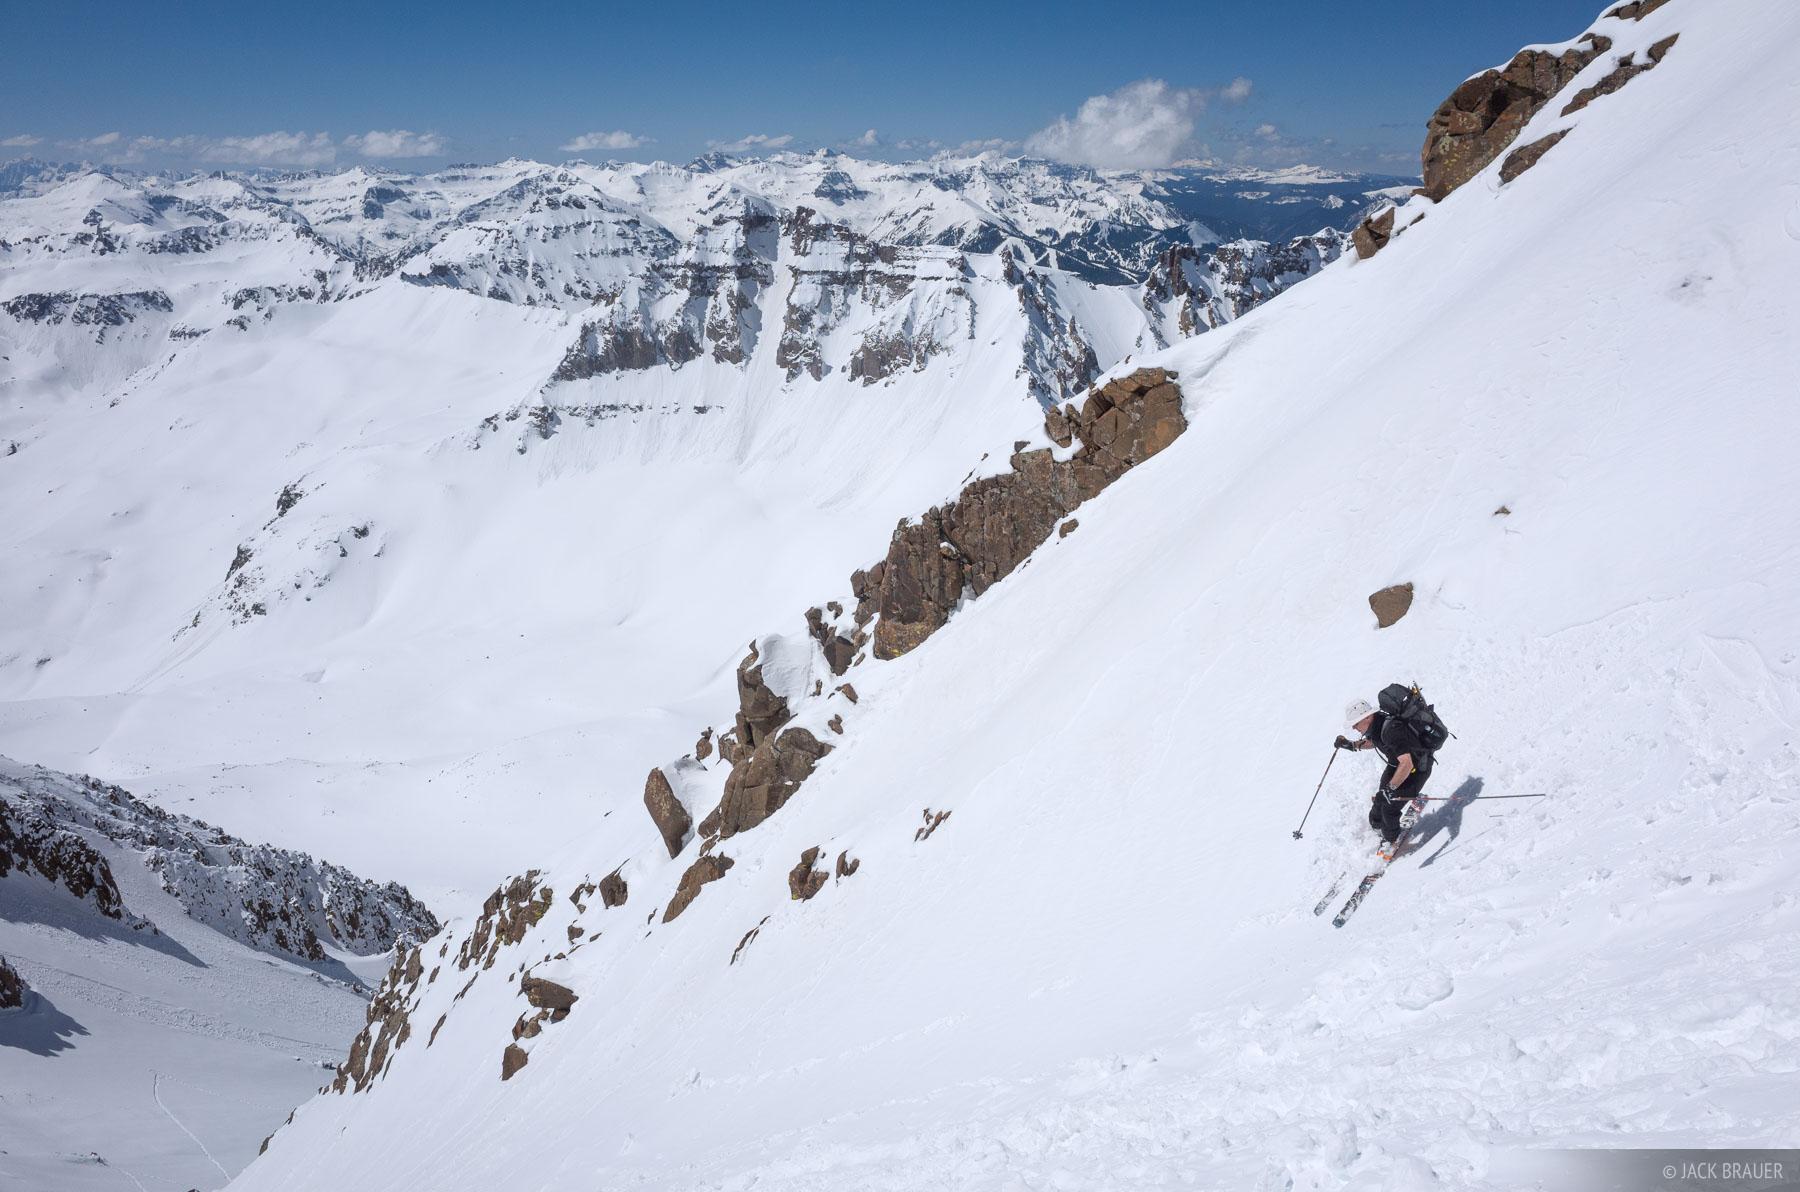 Colorado,Mt. Sneffels,San Juan Mountains,Sneffels Range, skiing, photo